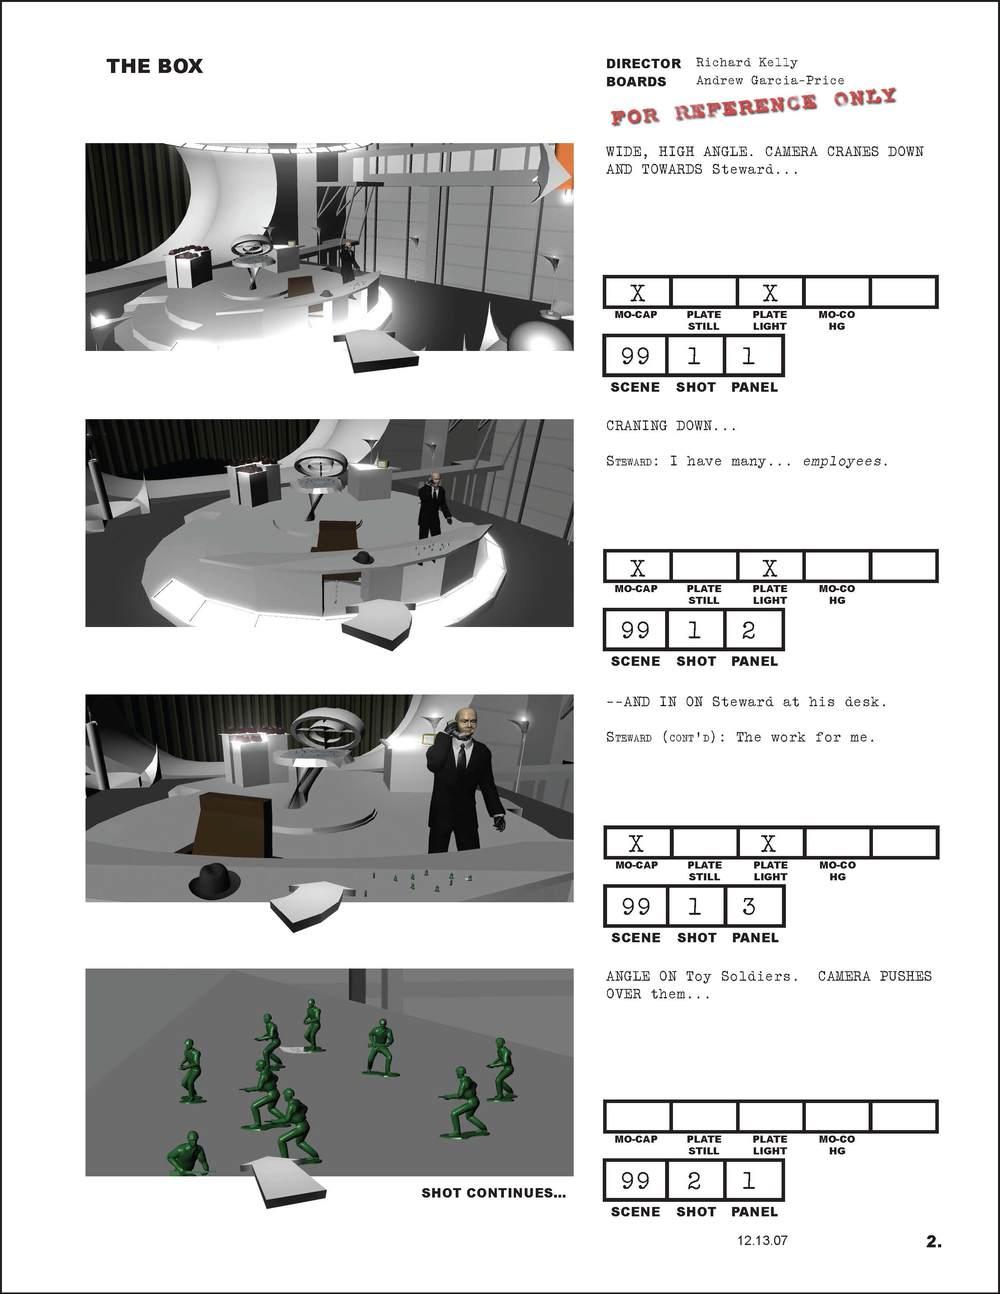 30 BOX_sc097-099_071213_Page_2.jpg